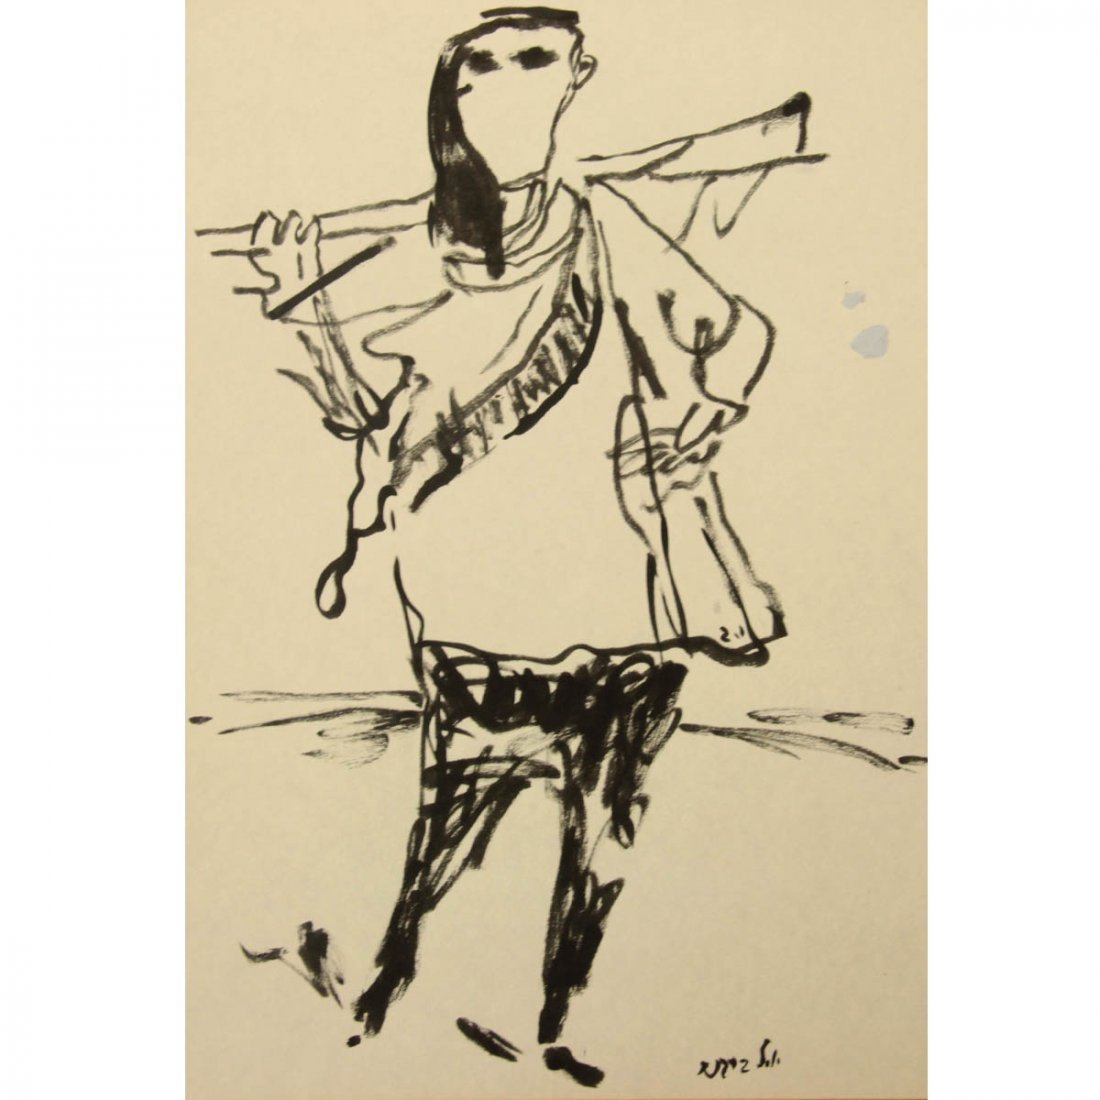 Yosl Bergner (1920-2017) - Guard, Ink on Paper.